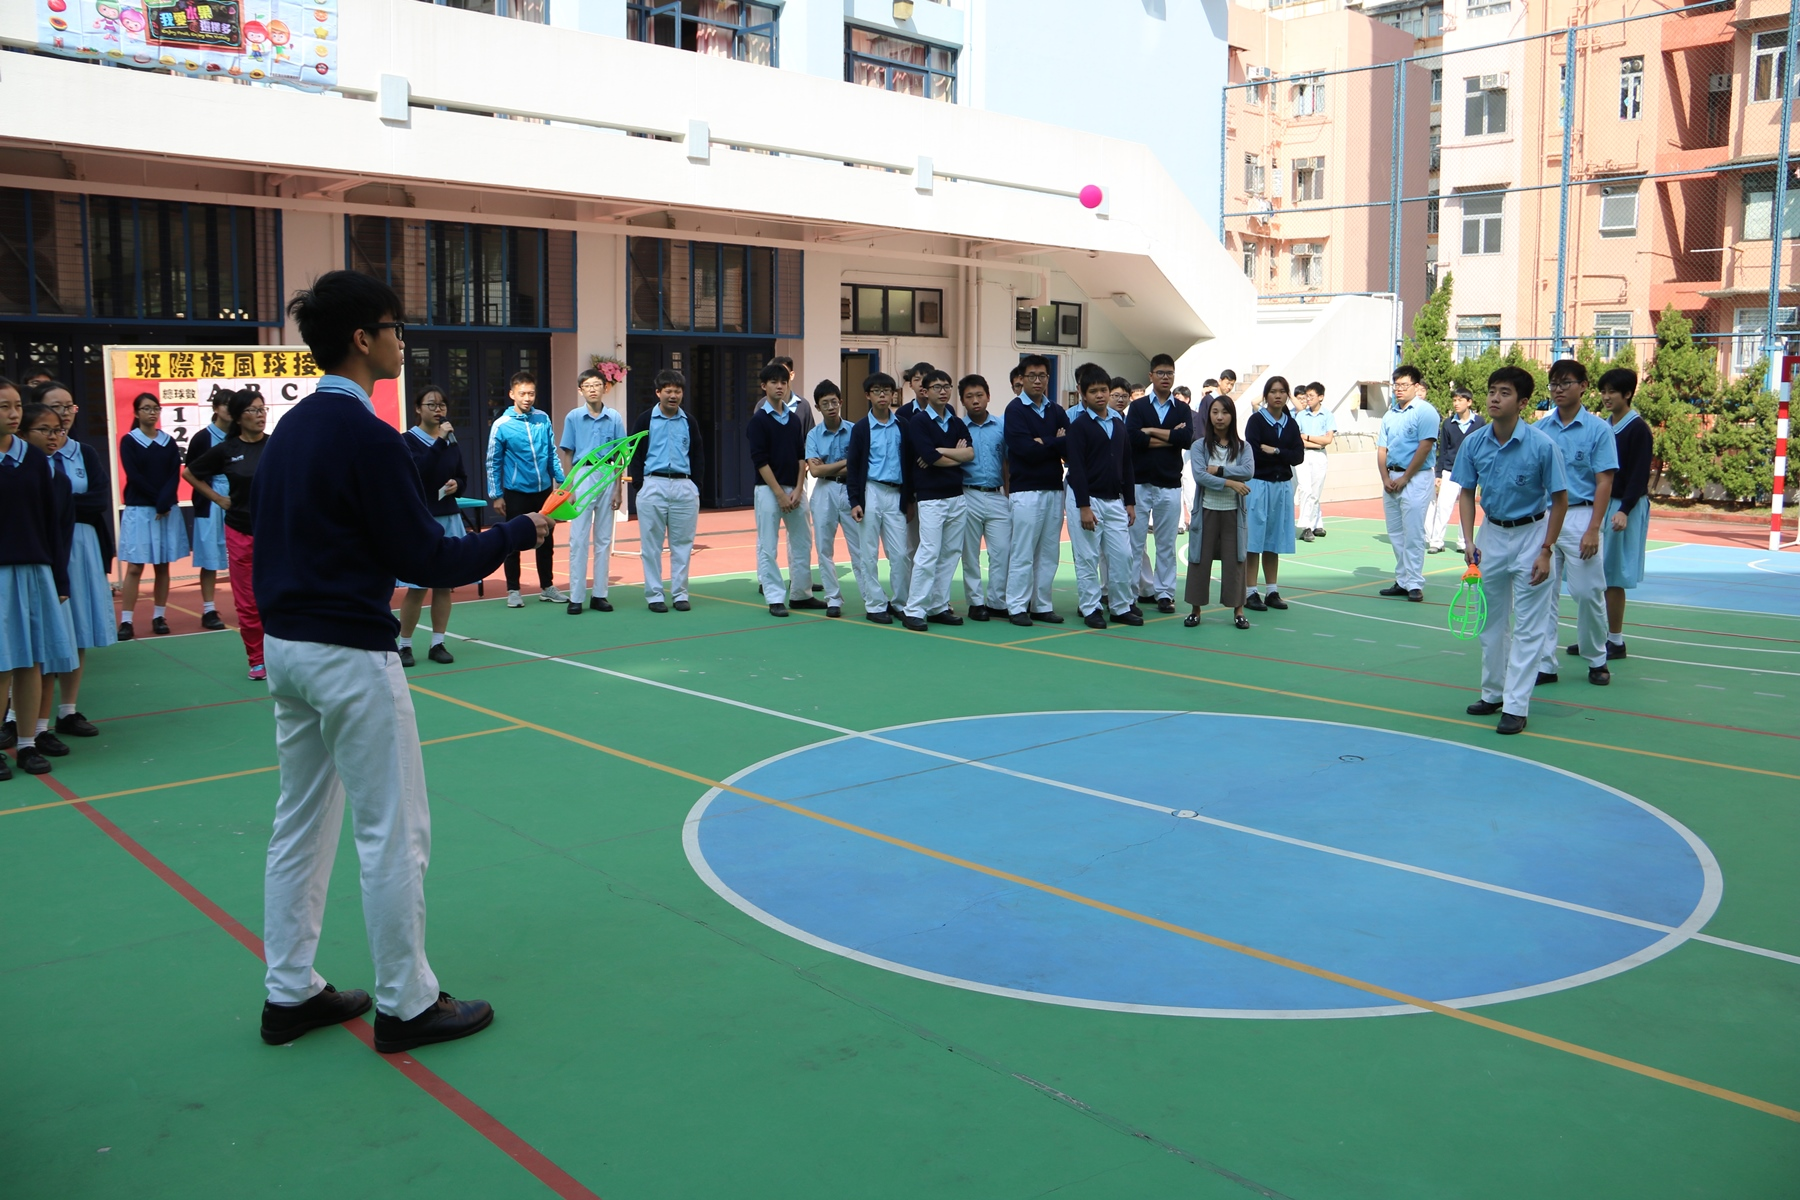 http://npc.edu.hk/sites/default/files/img_1711.jpg